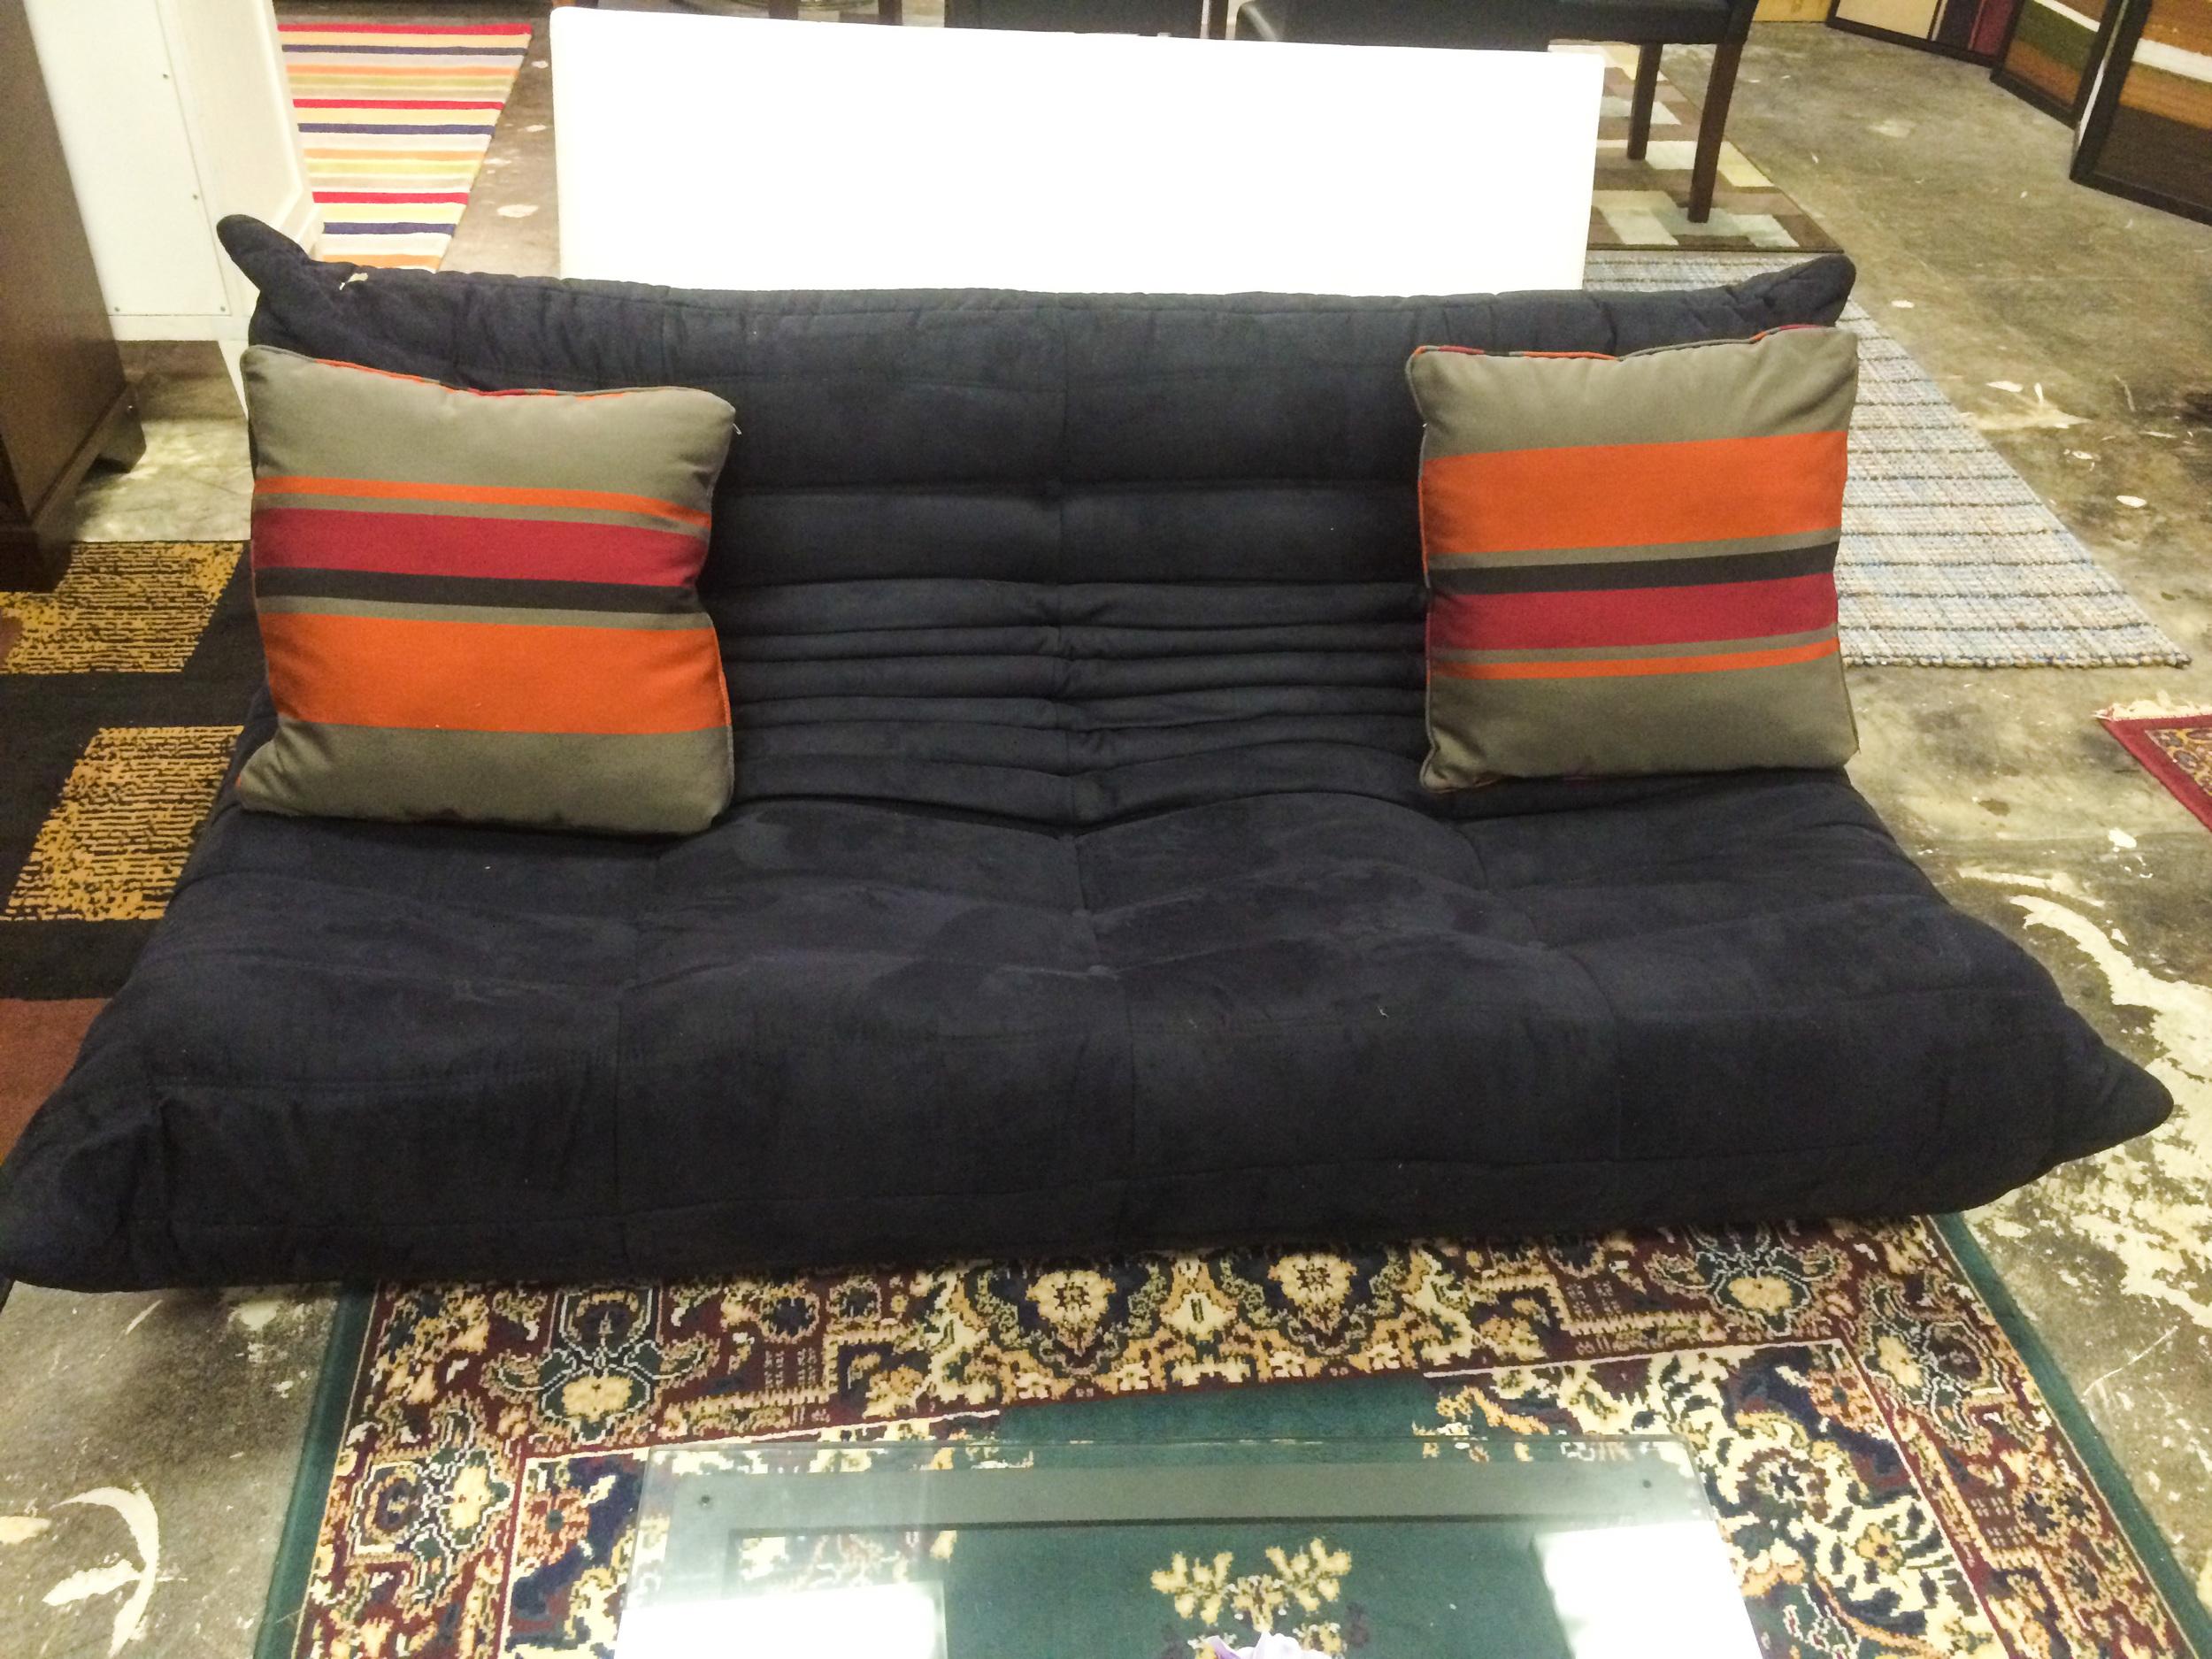 Alphaville Downlow Sofa